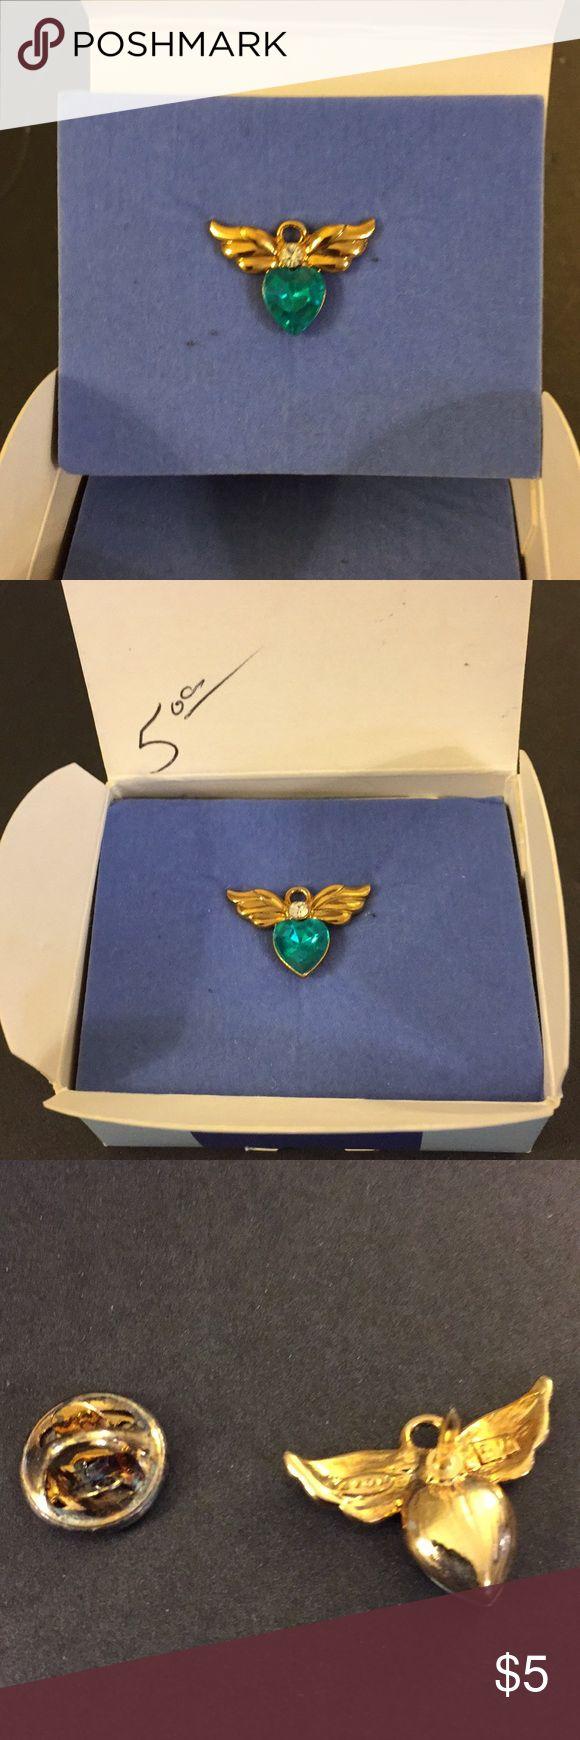 Avon angel December birth stone pin Tiny angel birthstone pin with simulated blue topaz, original box, never worn Jewelry Brooches